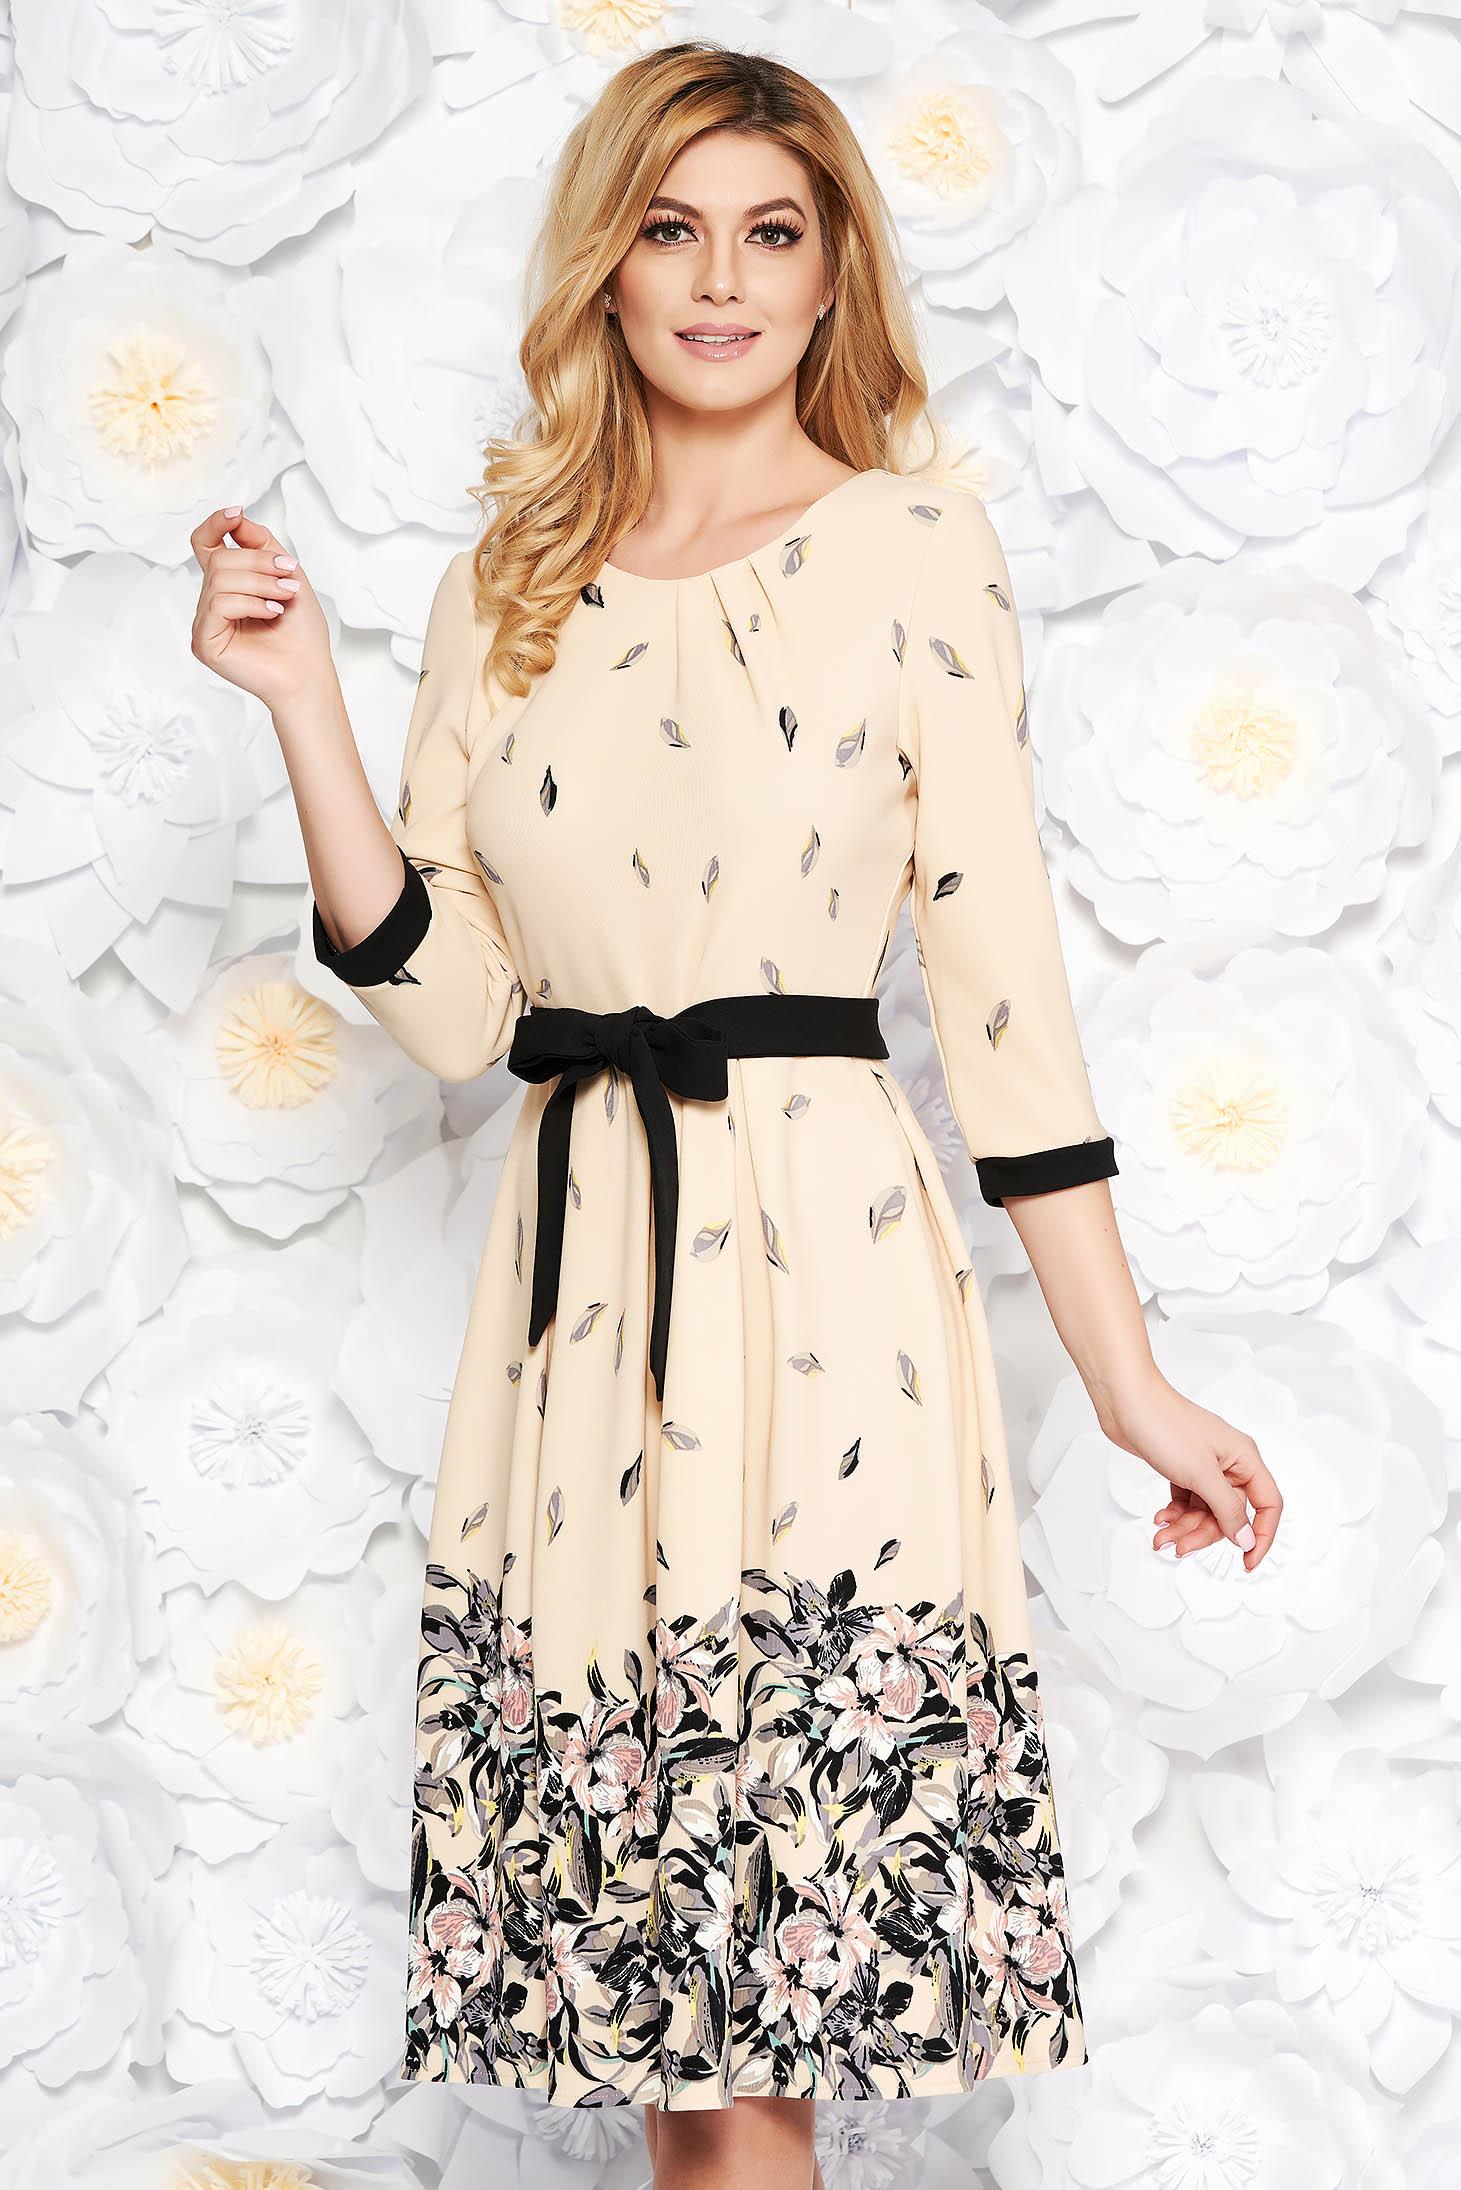 Krém elegáns harang ruha finom tapintású anyag övvel ellátva virágmintás